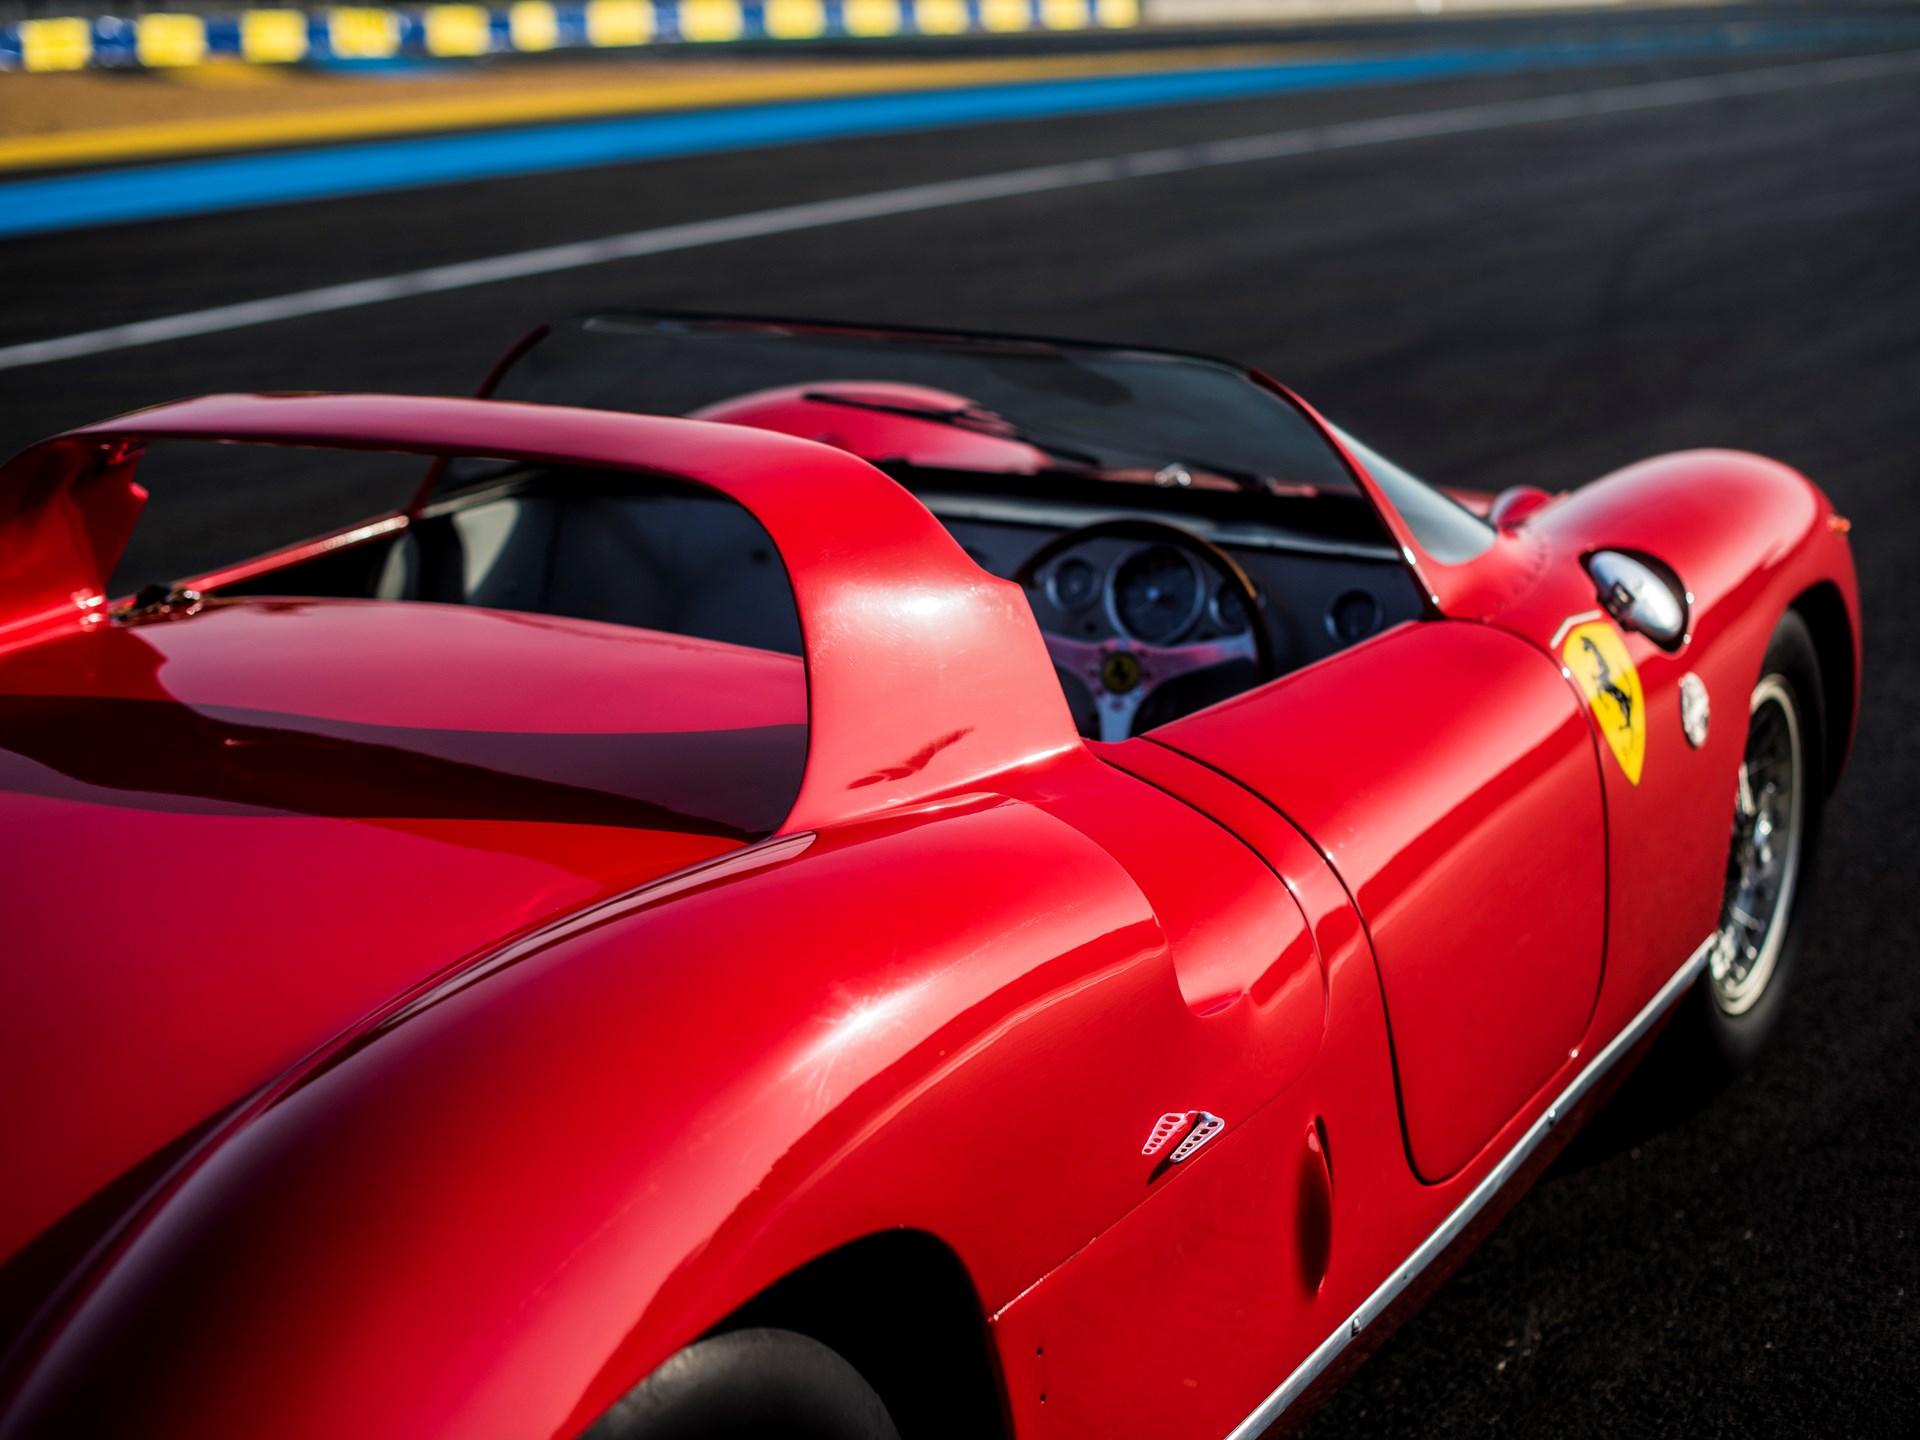 1963 Ferrari 275P Rear view interior